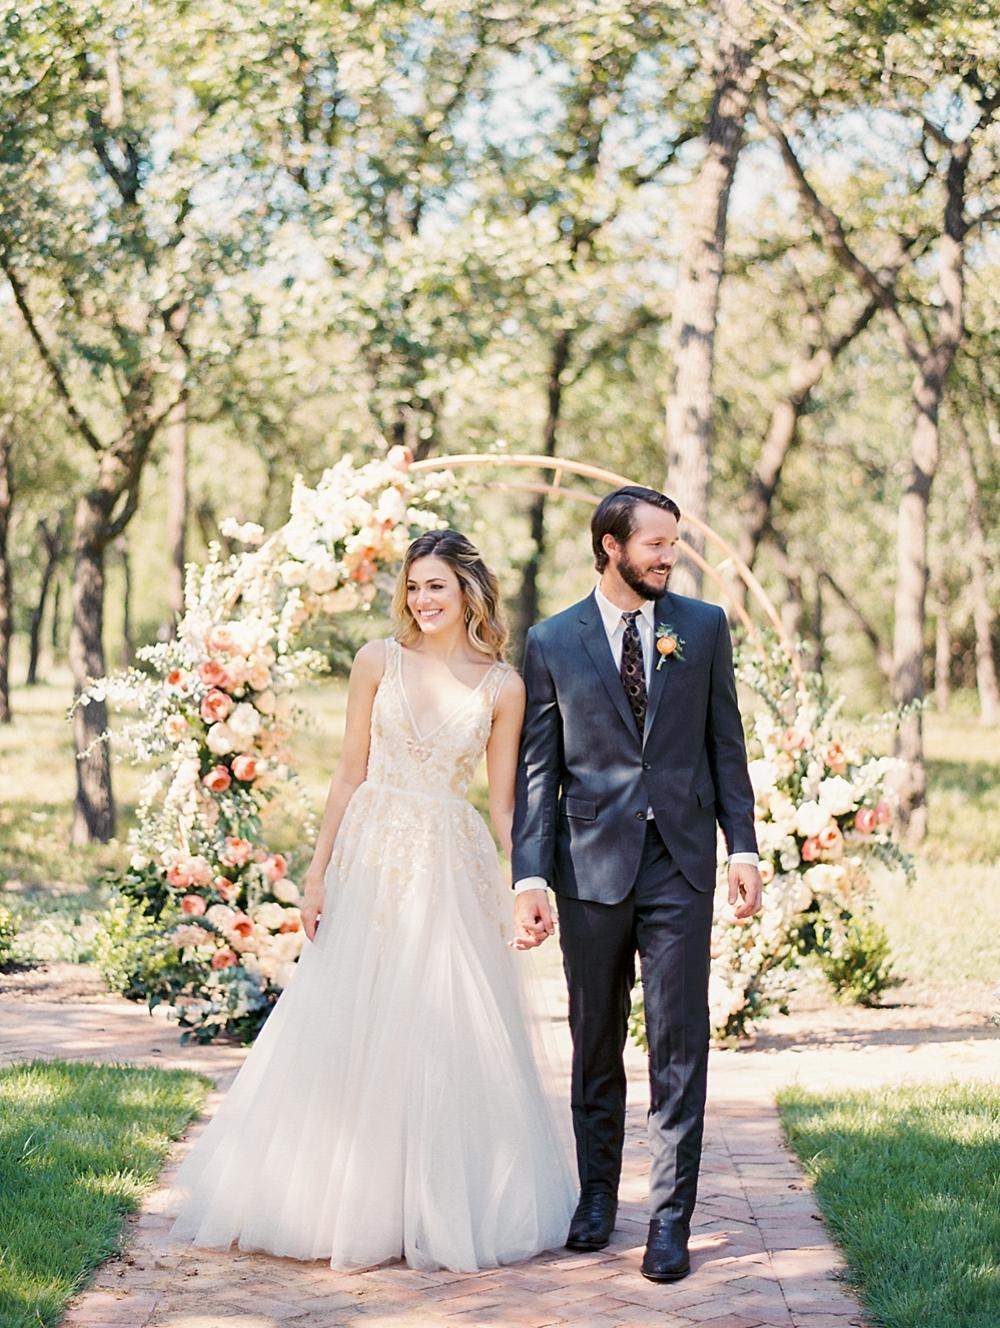 Kristin-La-Voie-Photography-Austin-Wedding-Photographer-the-grand-lady-70